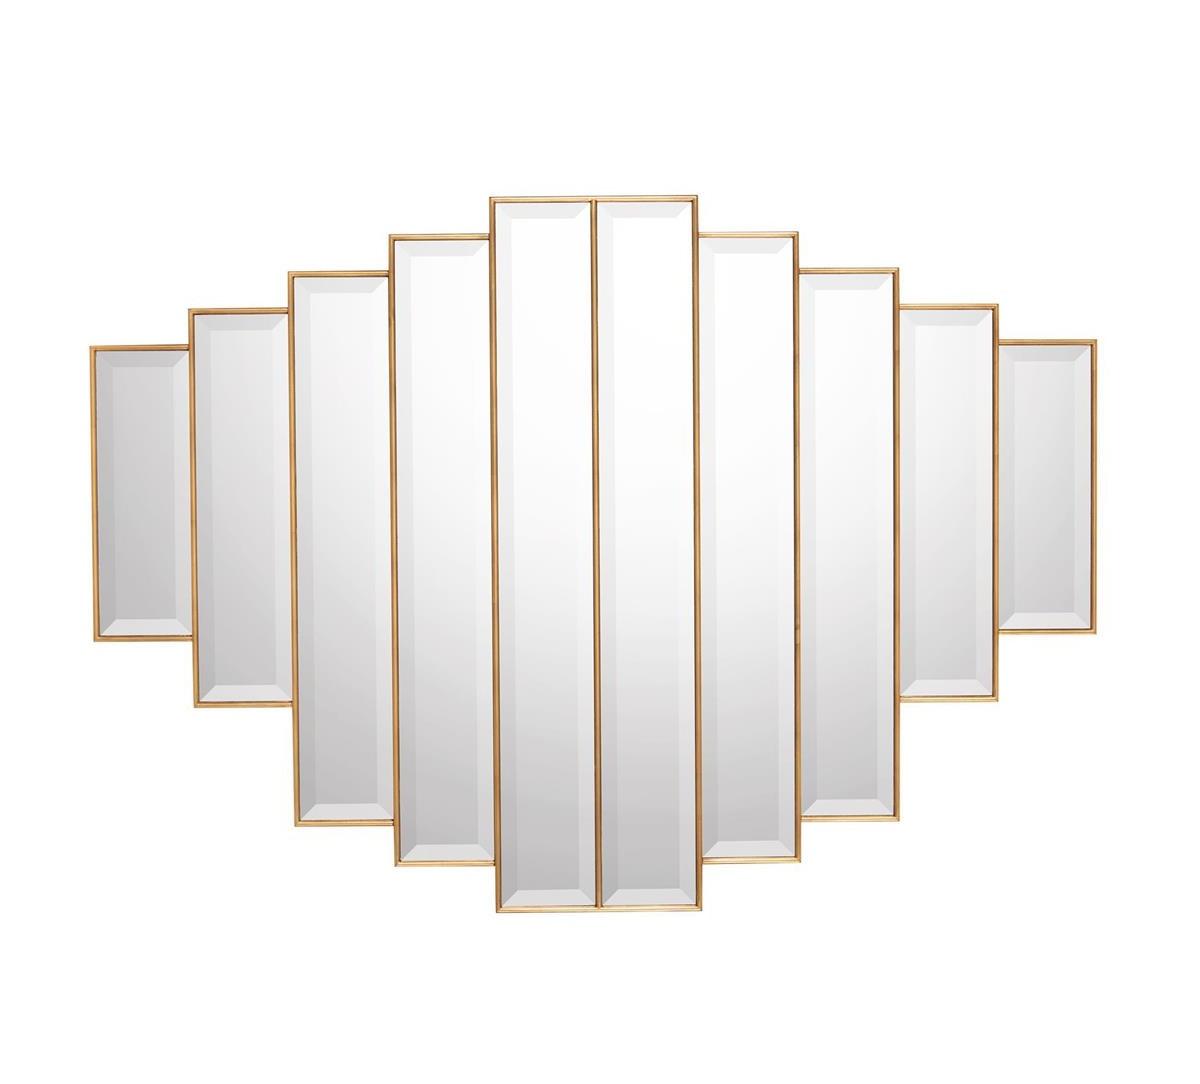 Benelli Mirror, John Richard Mirror, Brooklyn, New York, Furniture by ABD